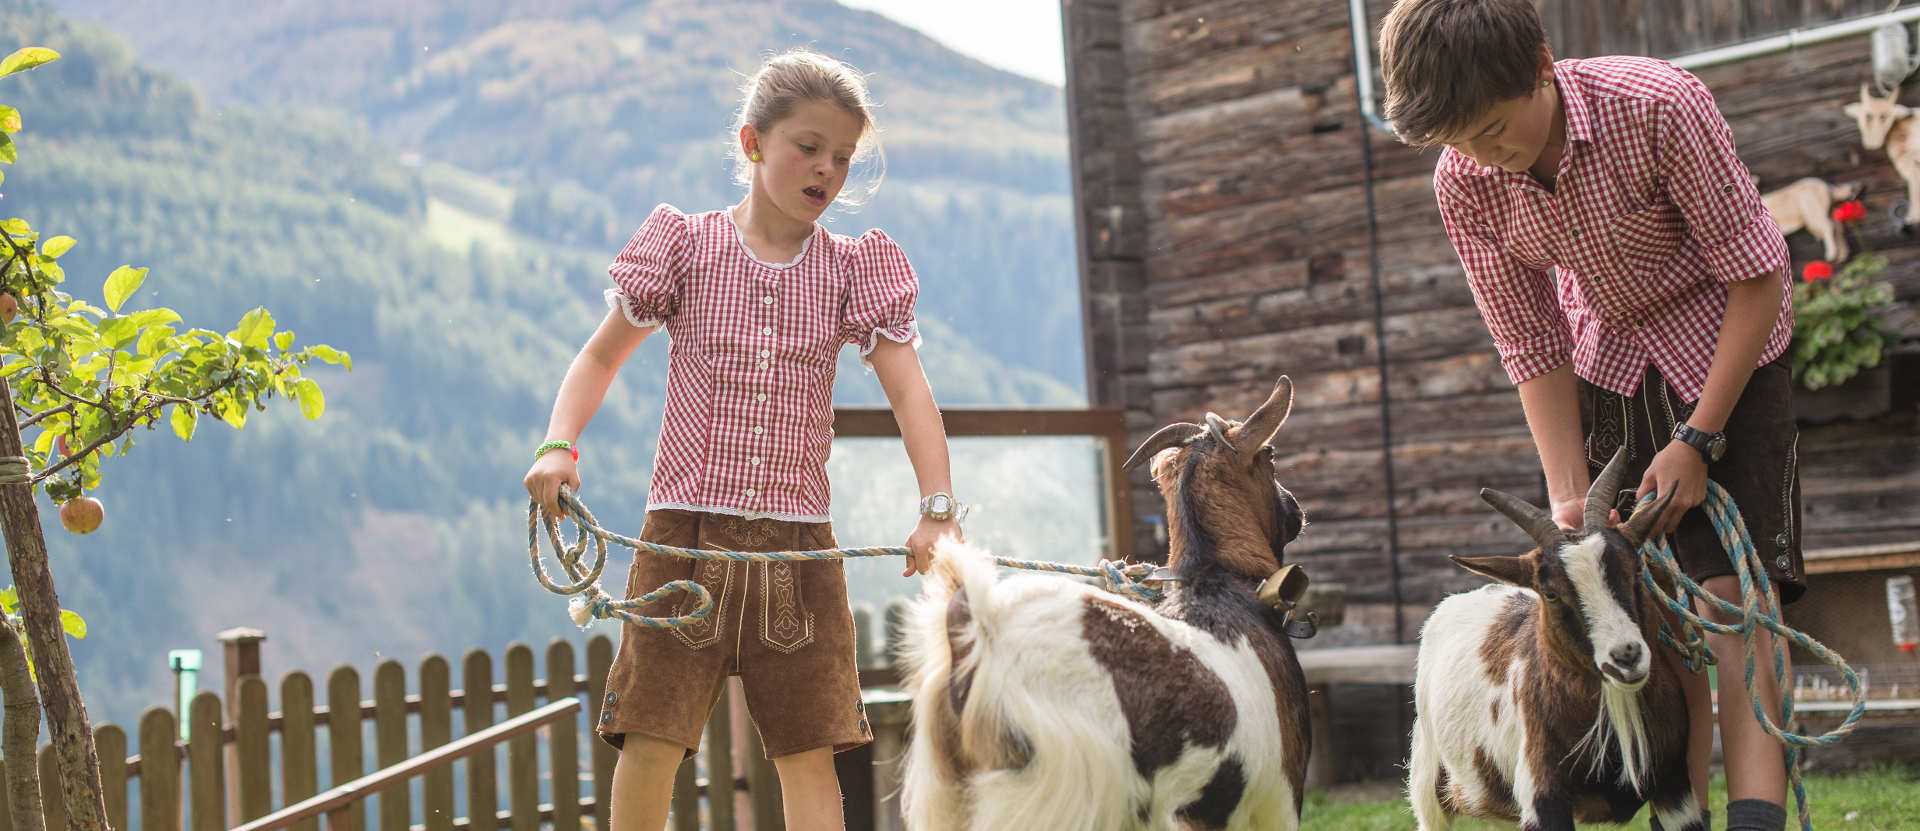 Oberkoflhof-Ahrntal-Urlaub